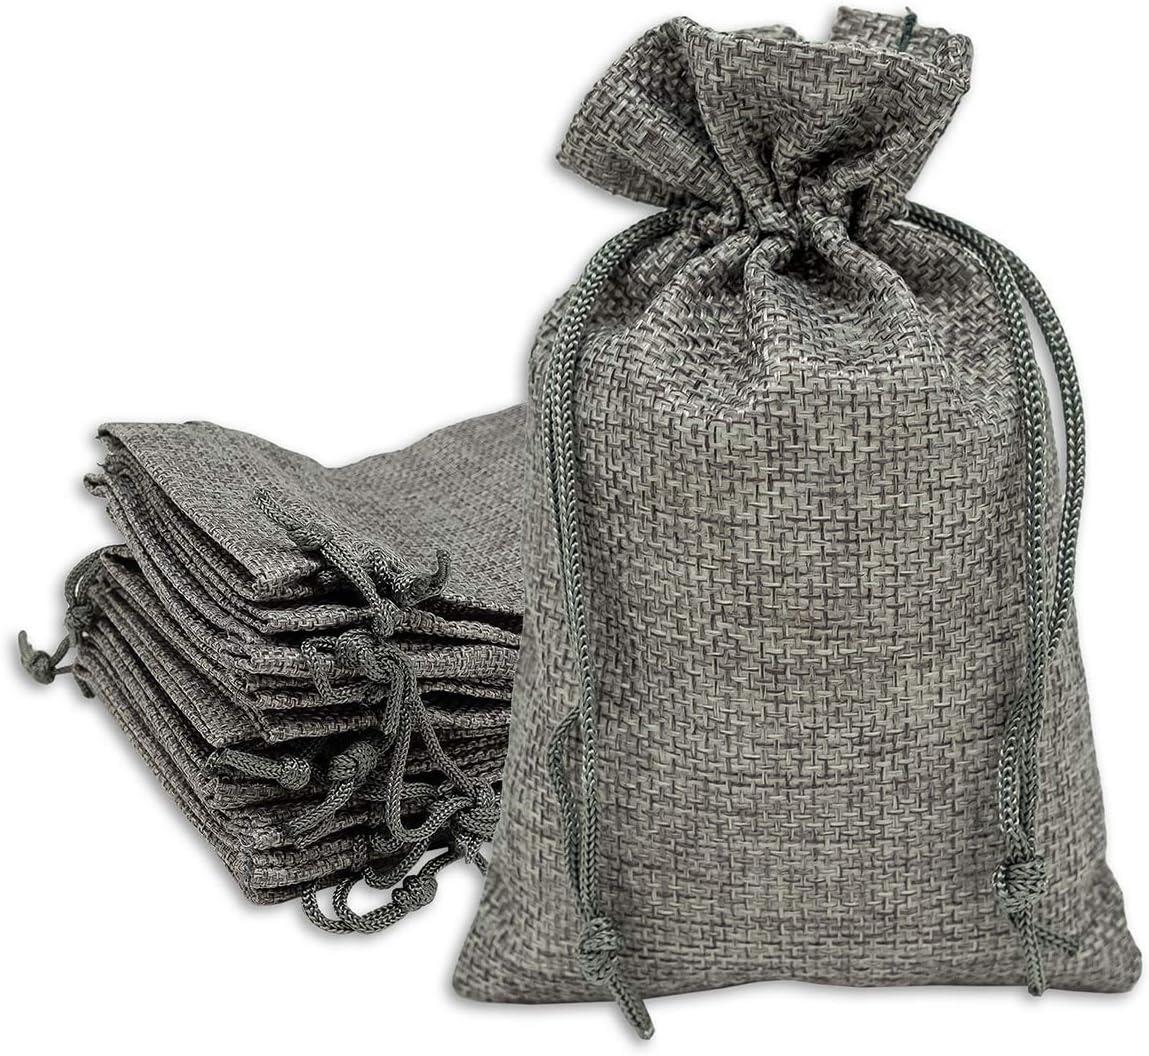 48 jewelry drawstring bags advent calendar bags,natural linen bags Natural Linen Drawstring Bags 3 x 4 drawstring bags